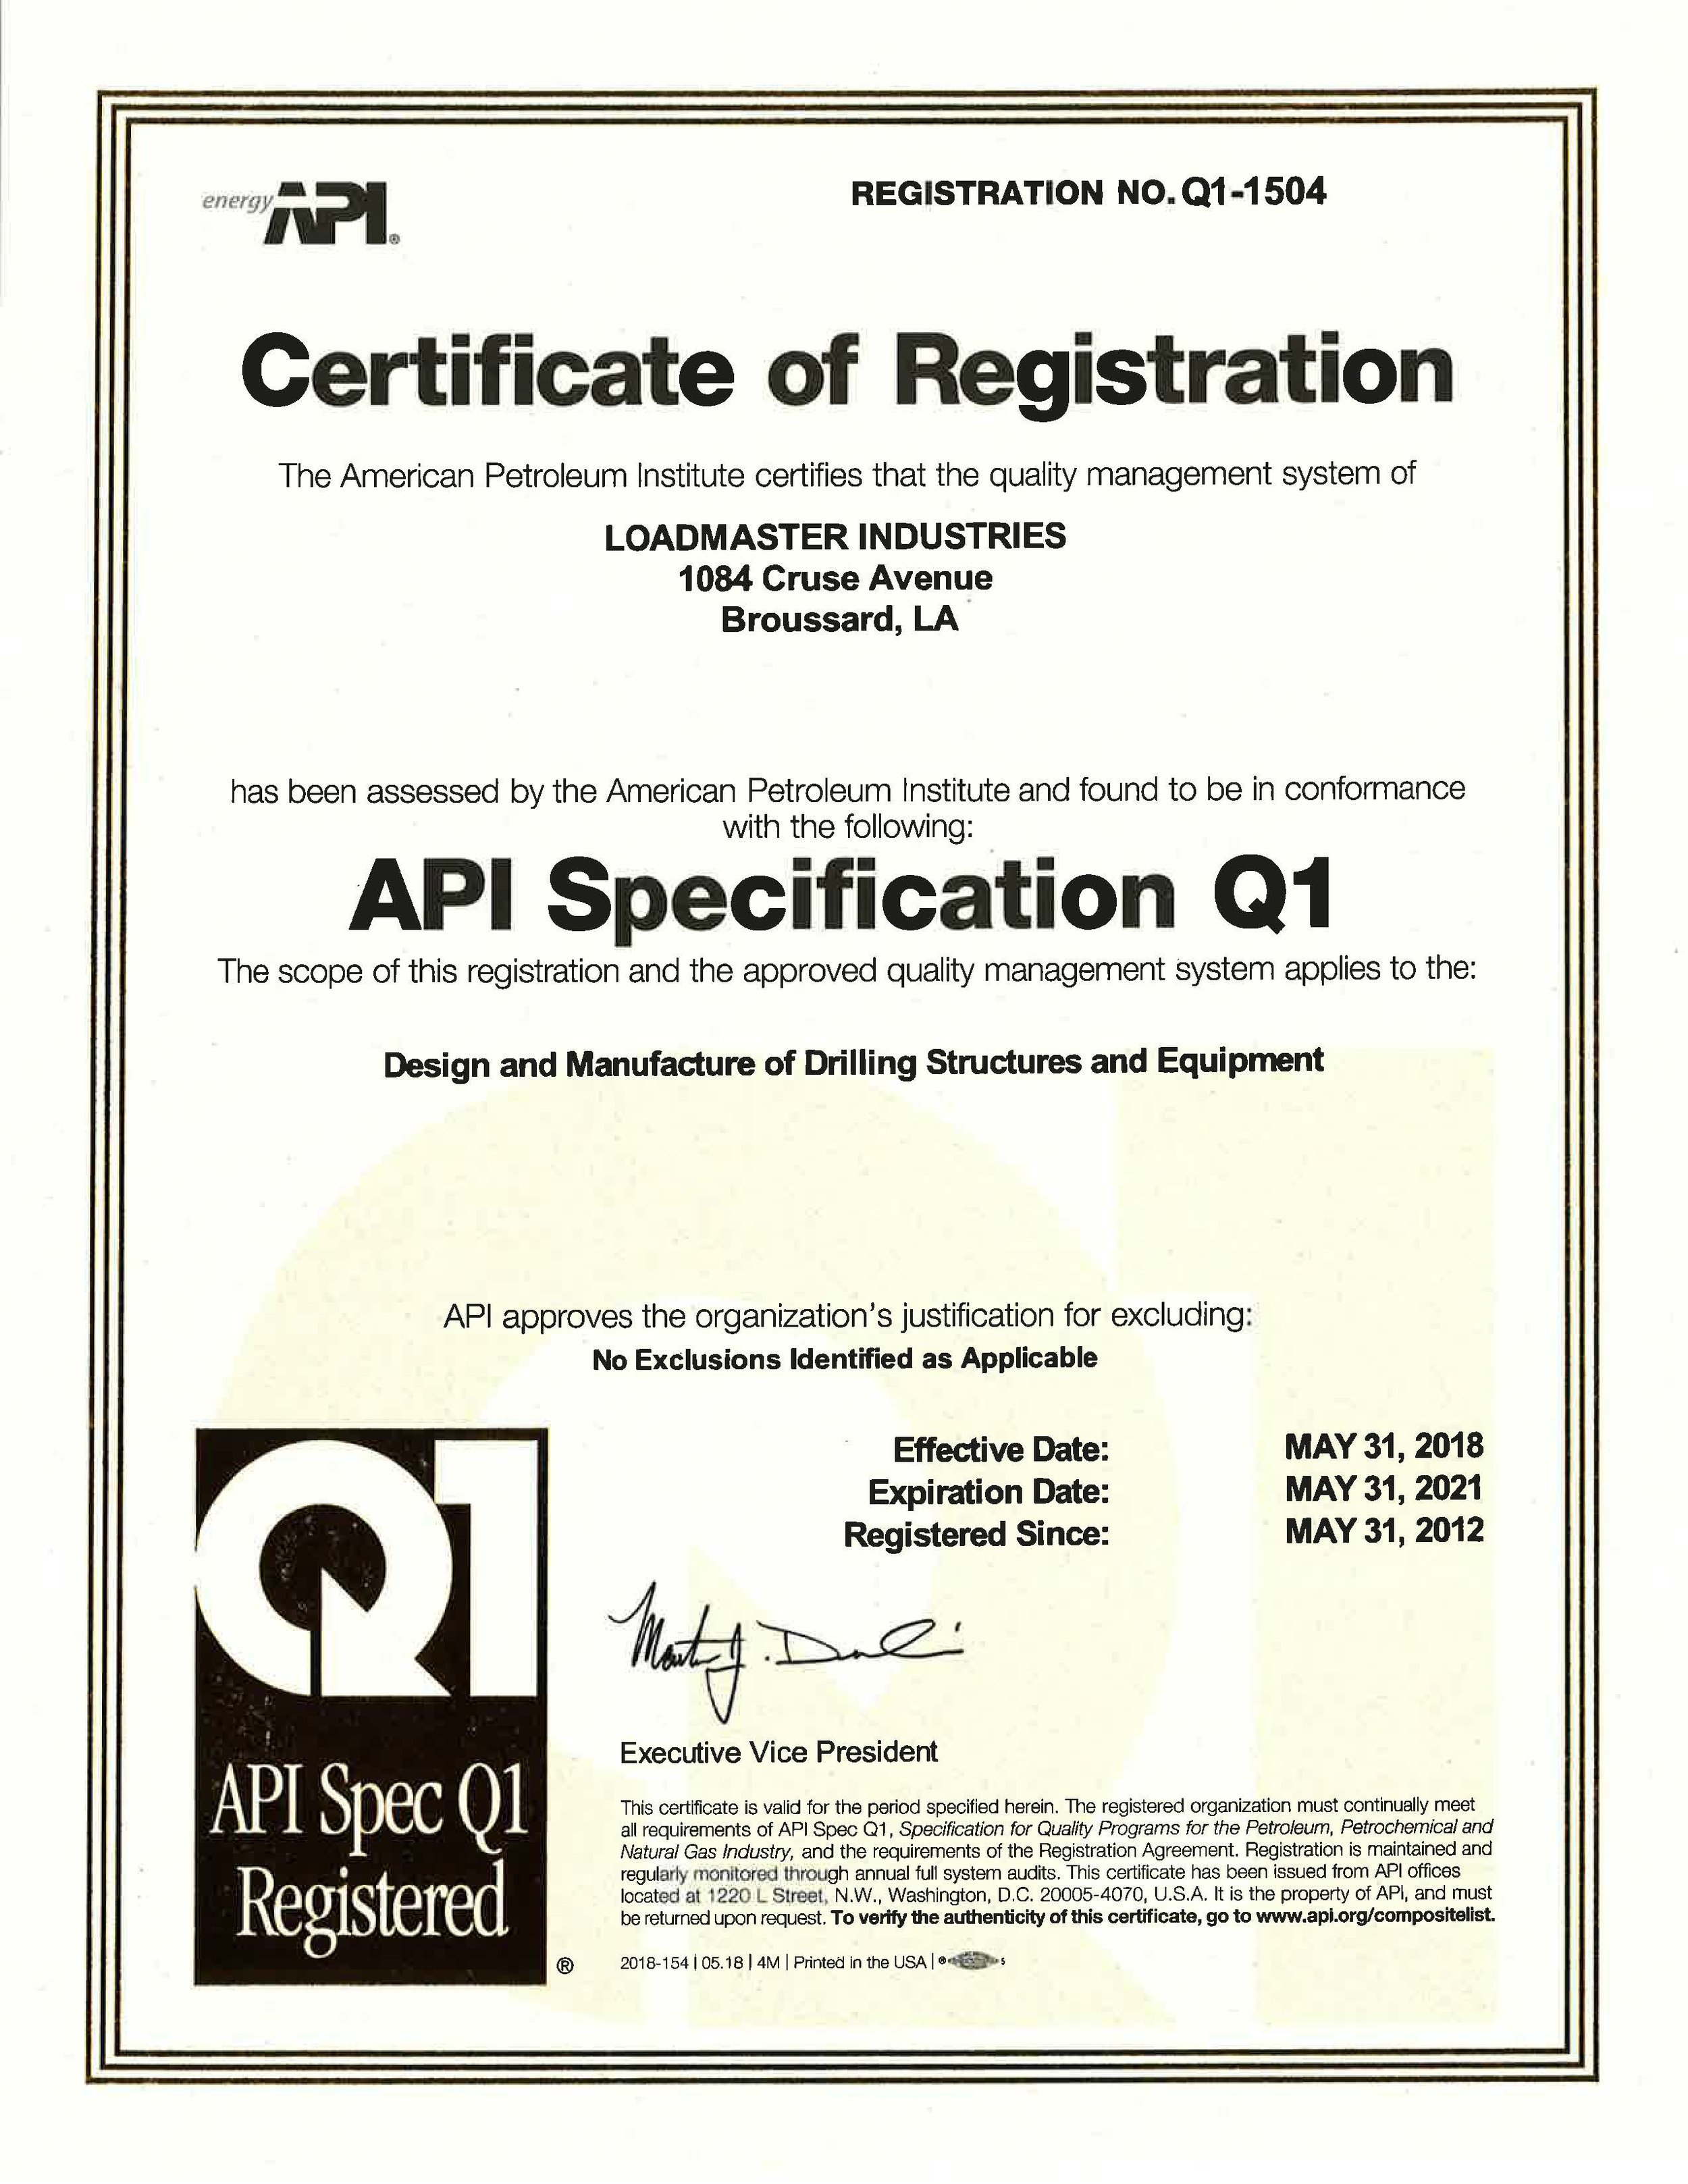 Q1 2018 Certificate Q1-1504.jpg